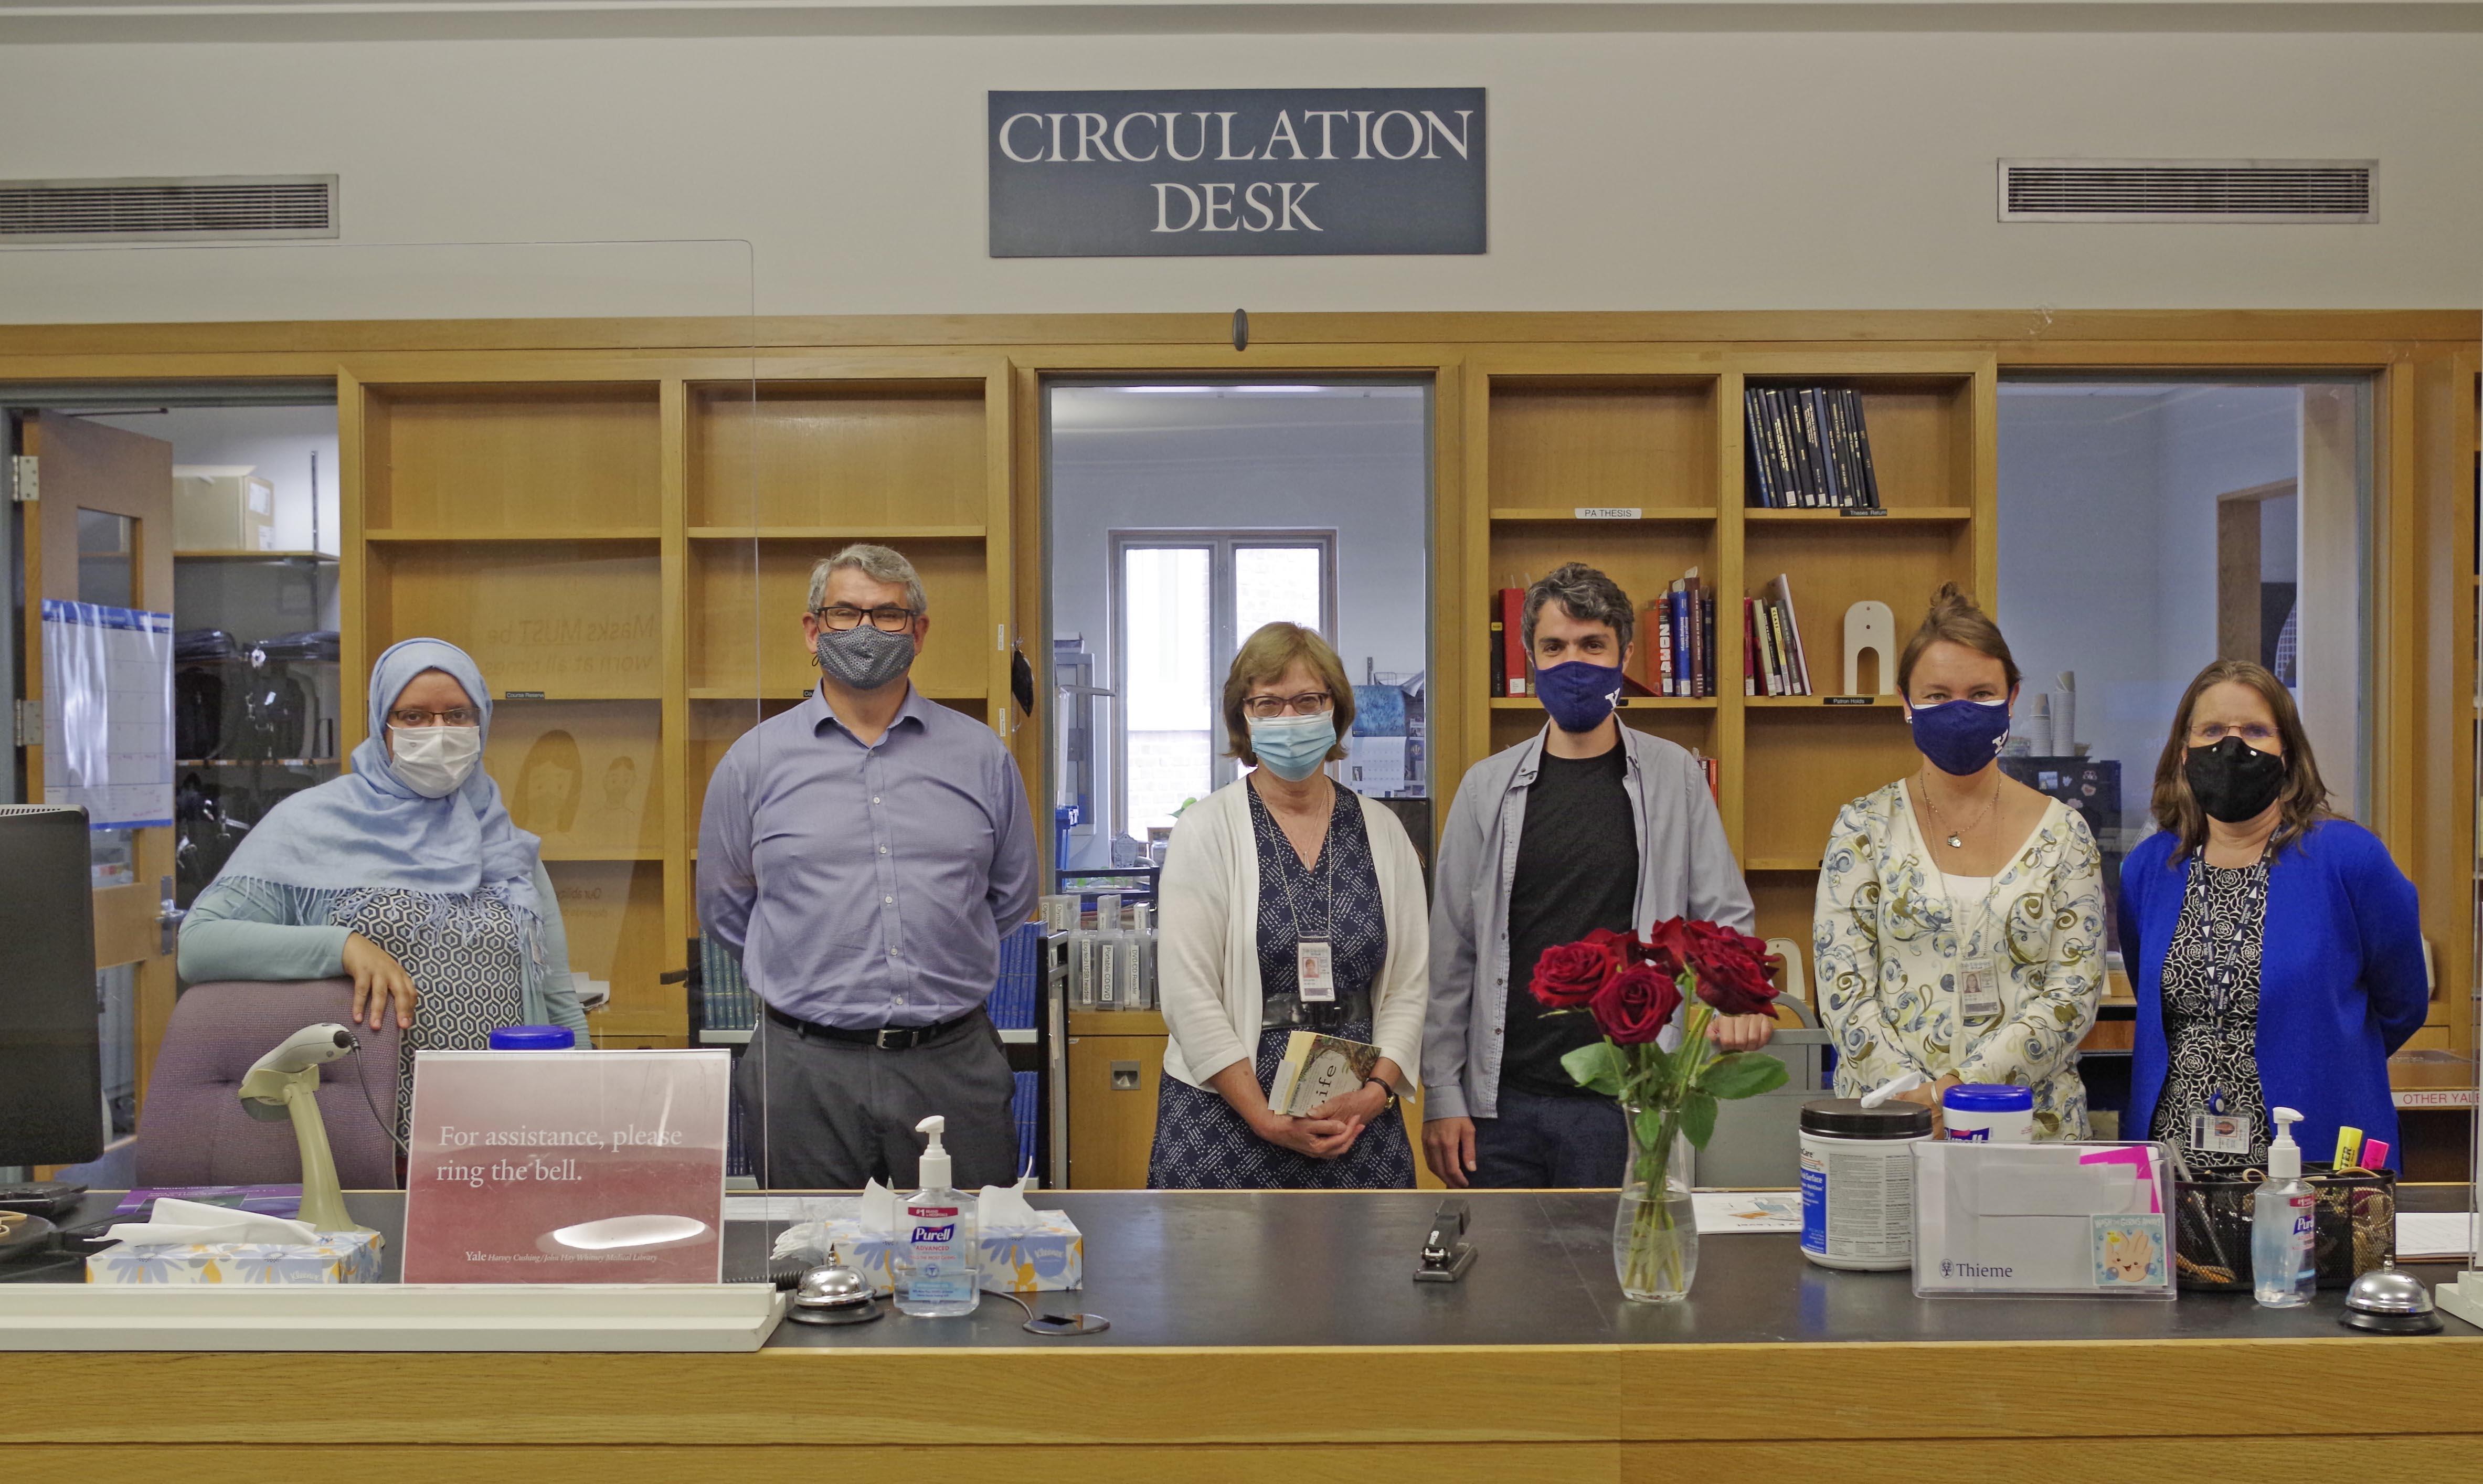 medical library staff at circulation desk